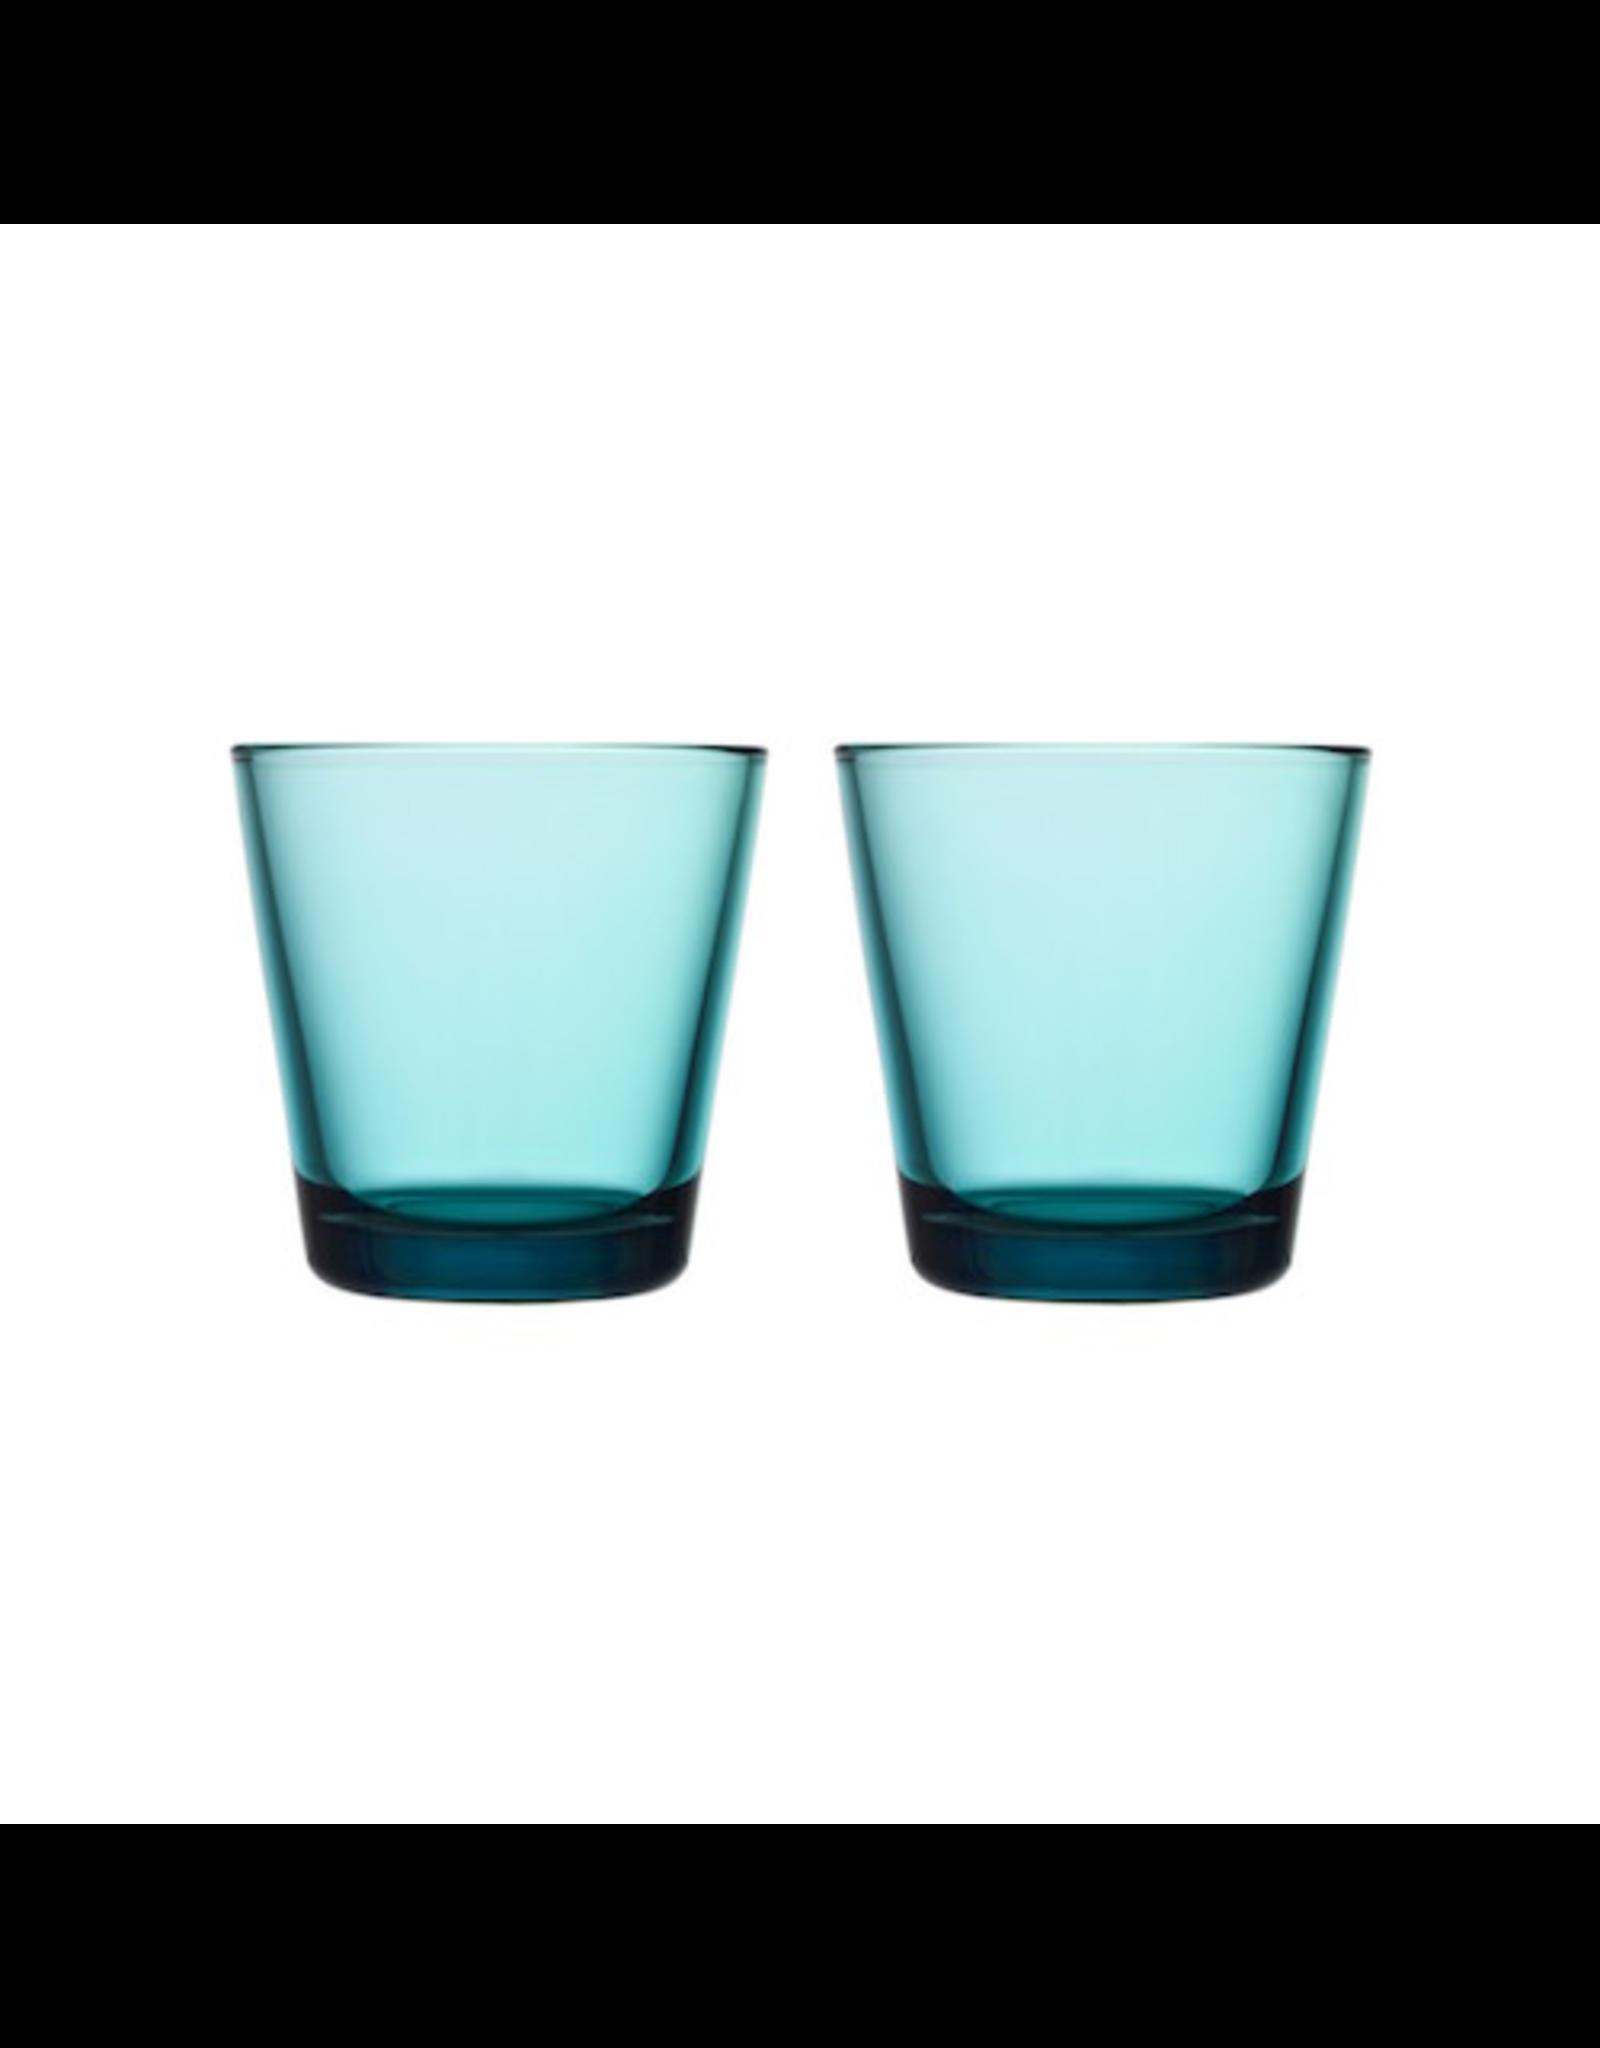 KARTIO 21 CL 水杯 (兩件裝)